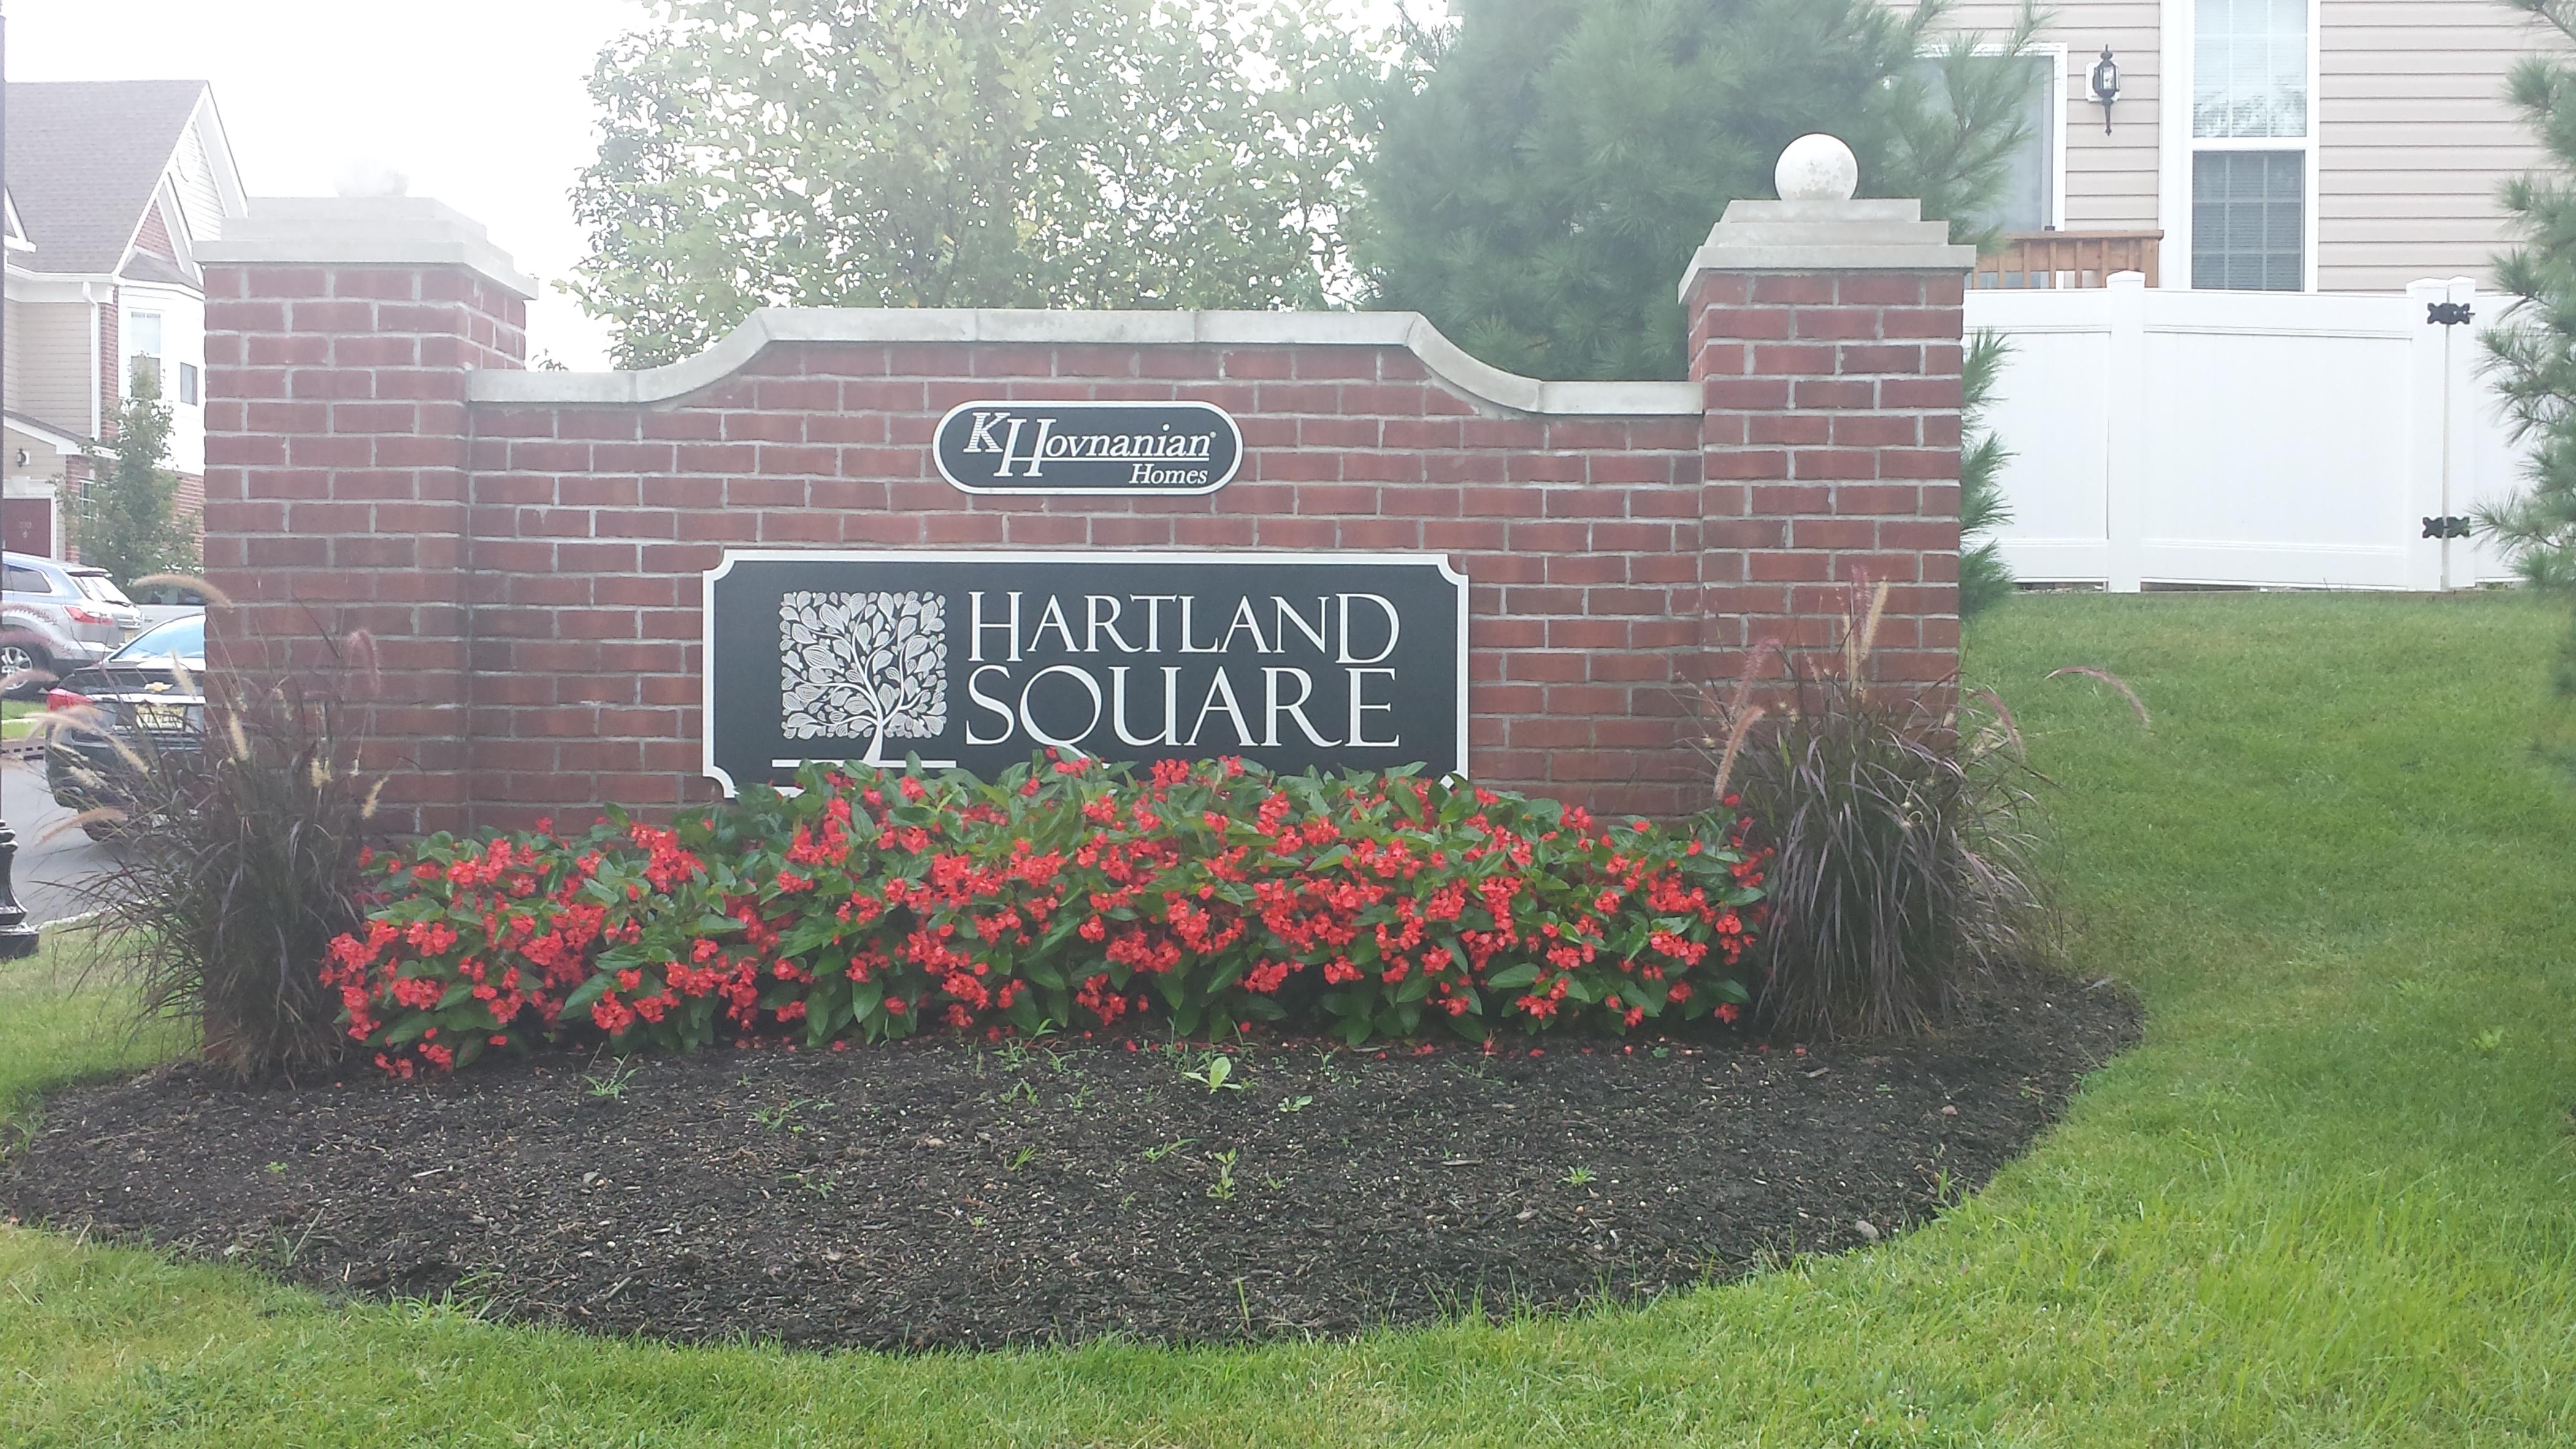 Hartland Square